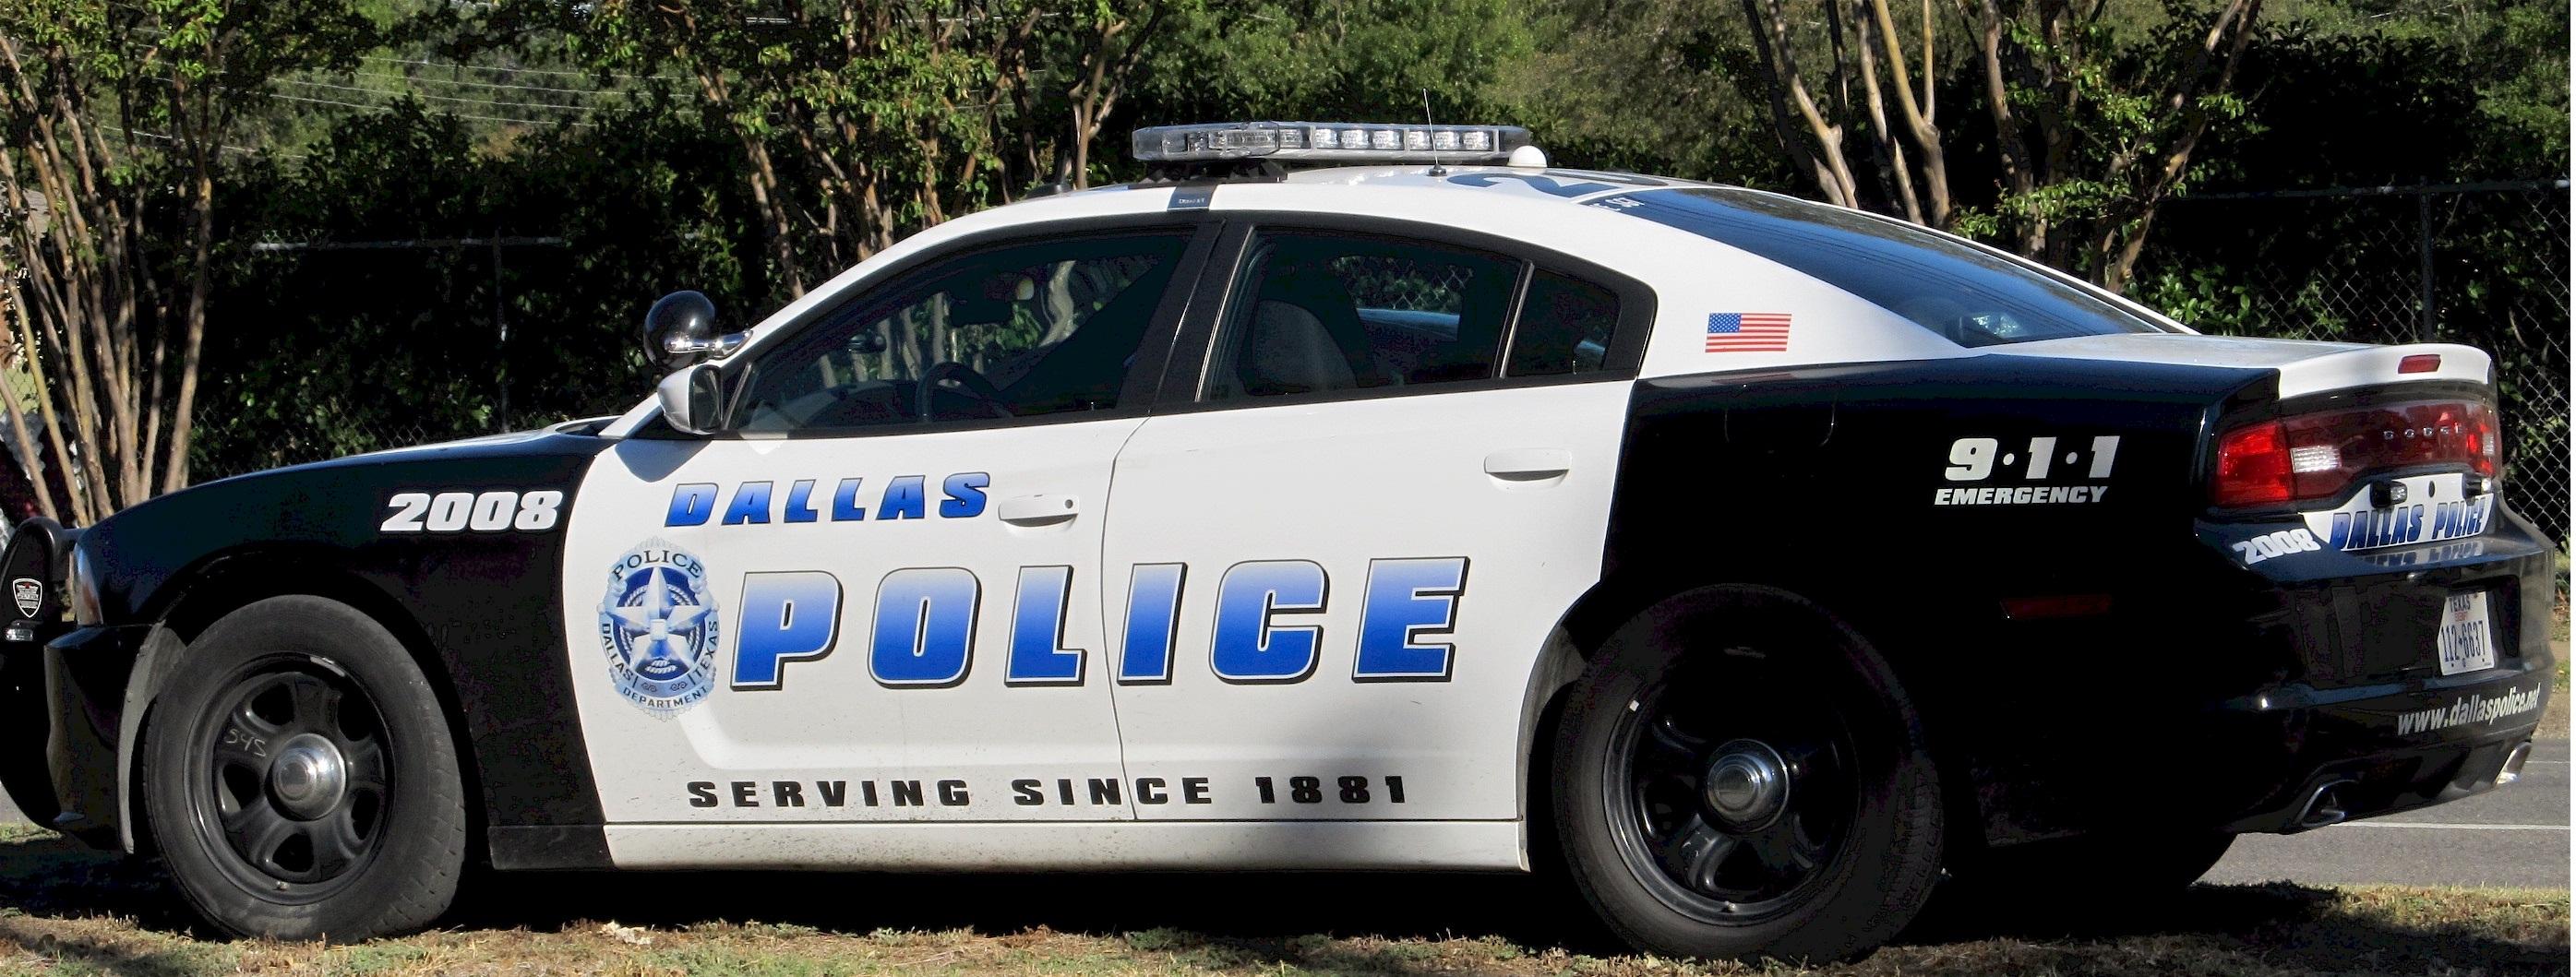 Police Car, Auto, Automobile, Car, Cop, HQ Photo